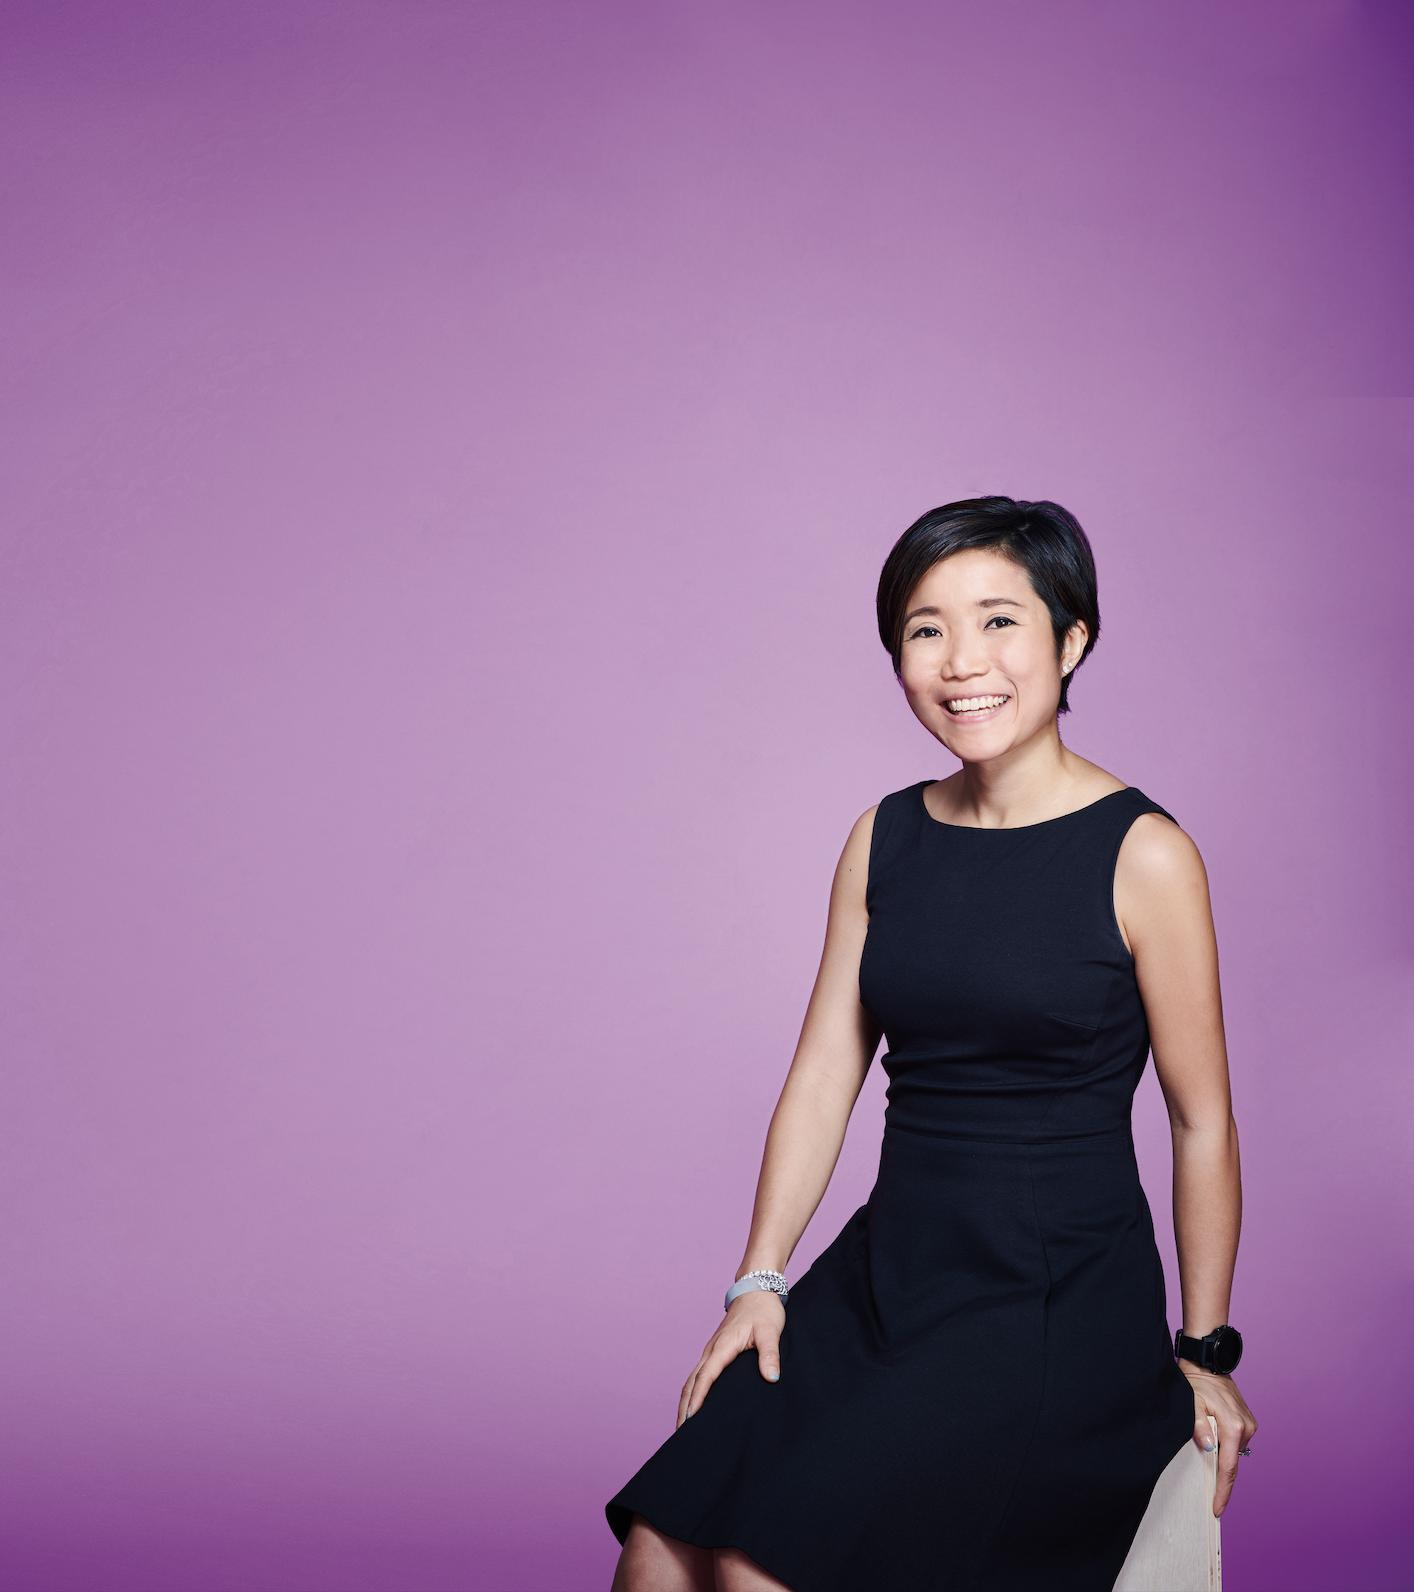 What Matters To Me: Vanessa Cheung